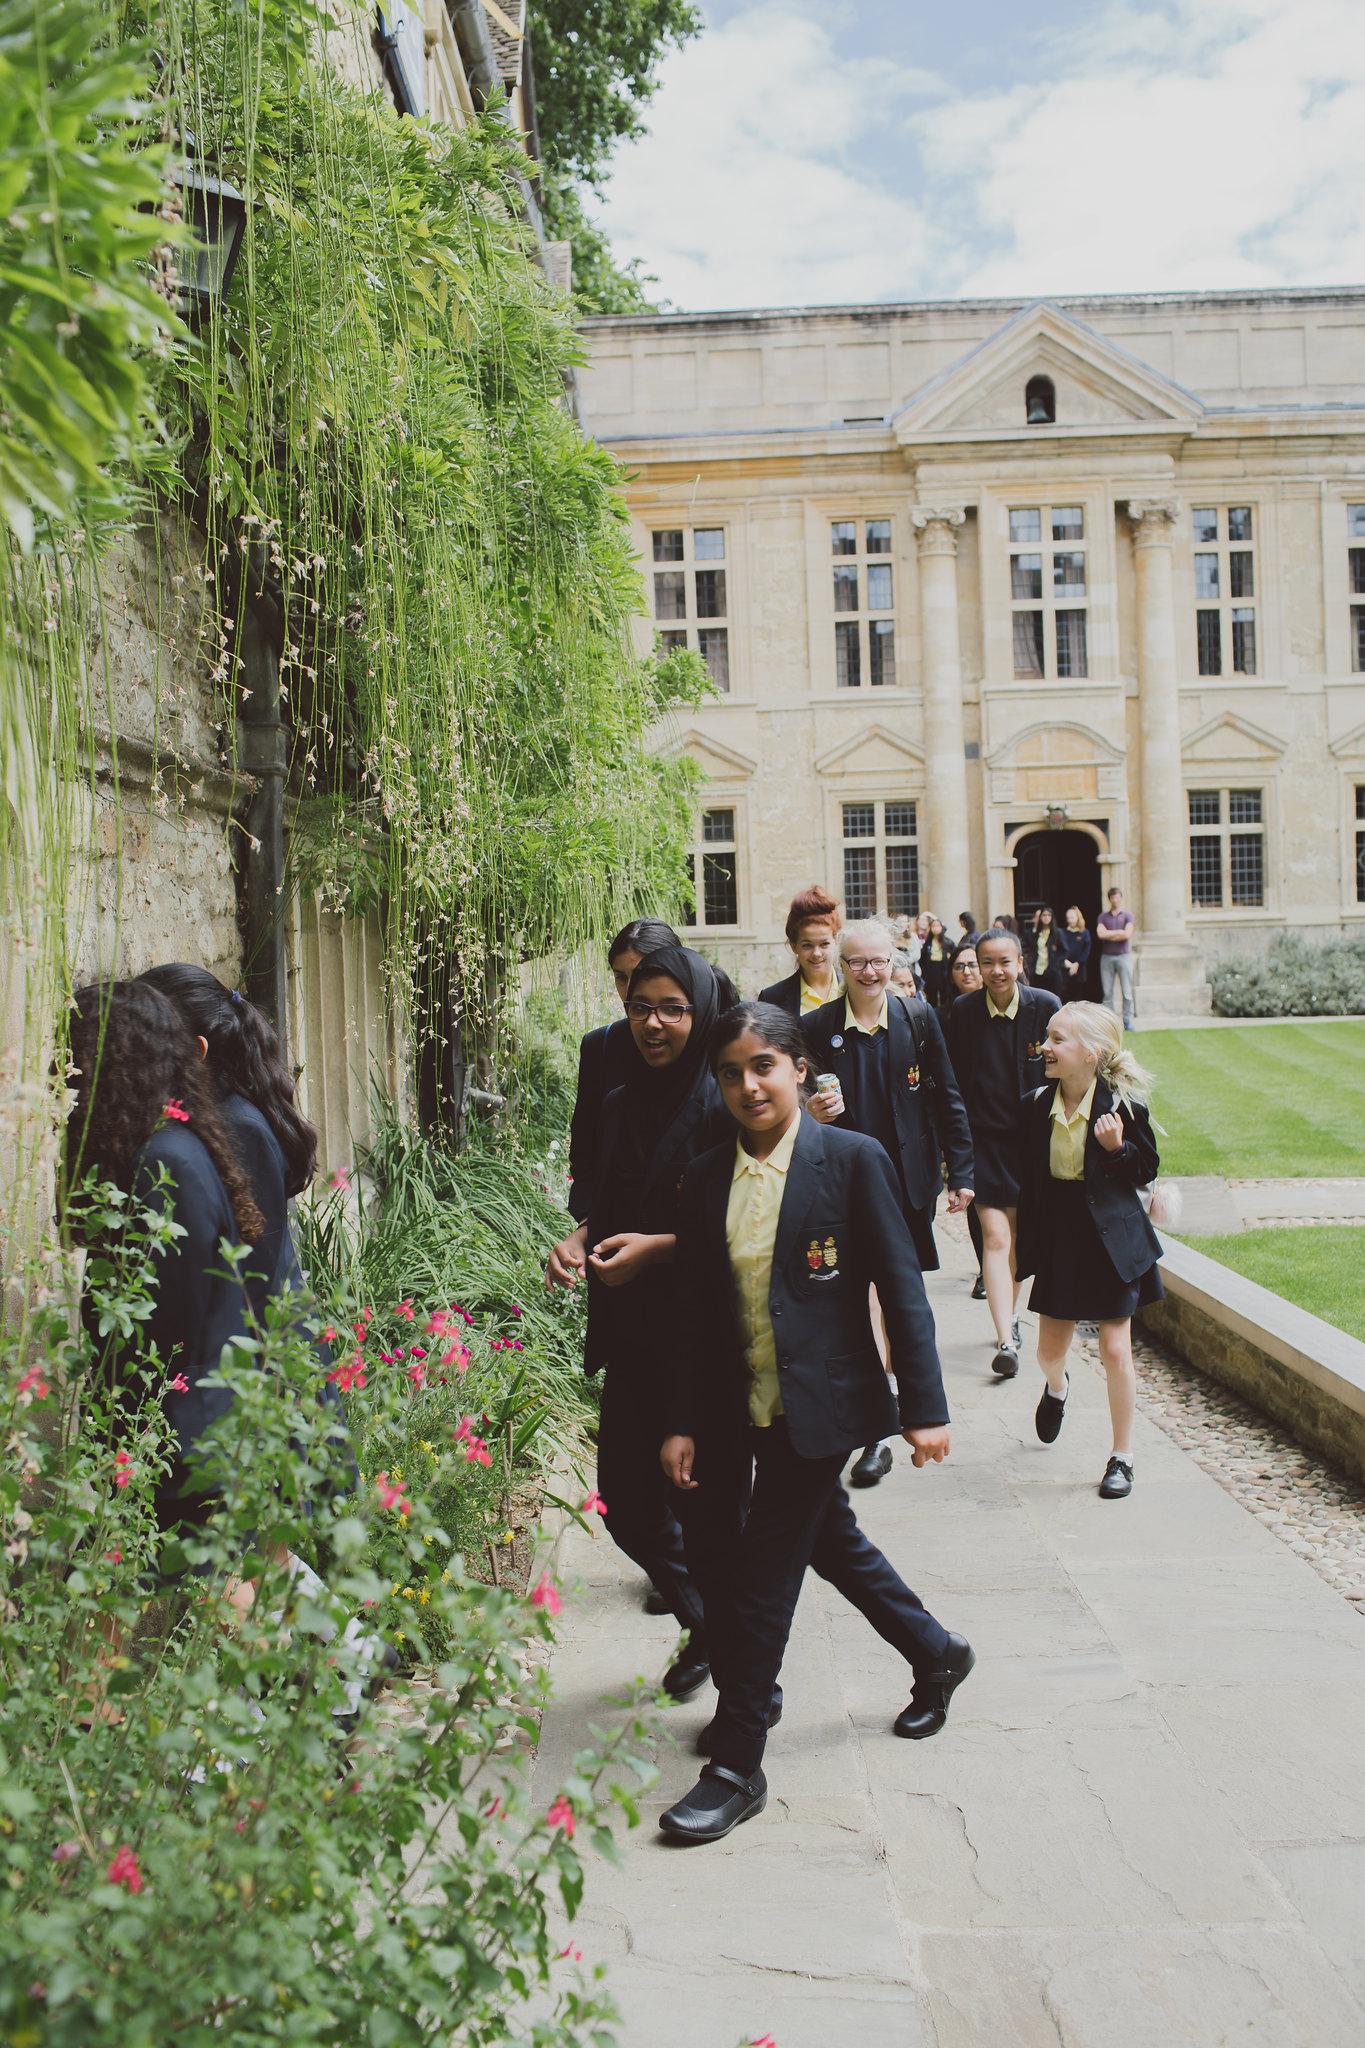 A school group visiting St Edmund Hall, Oxford.